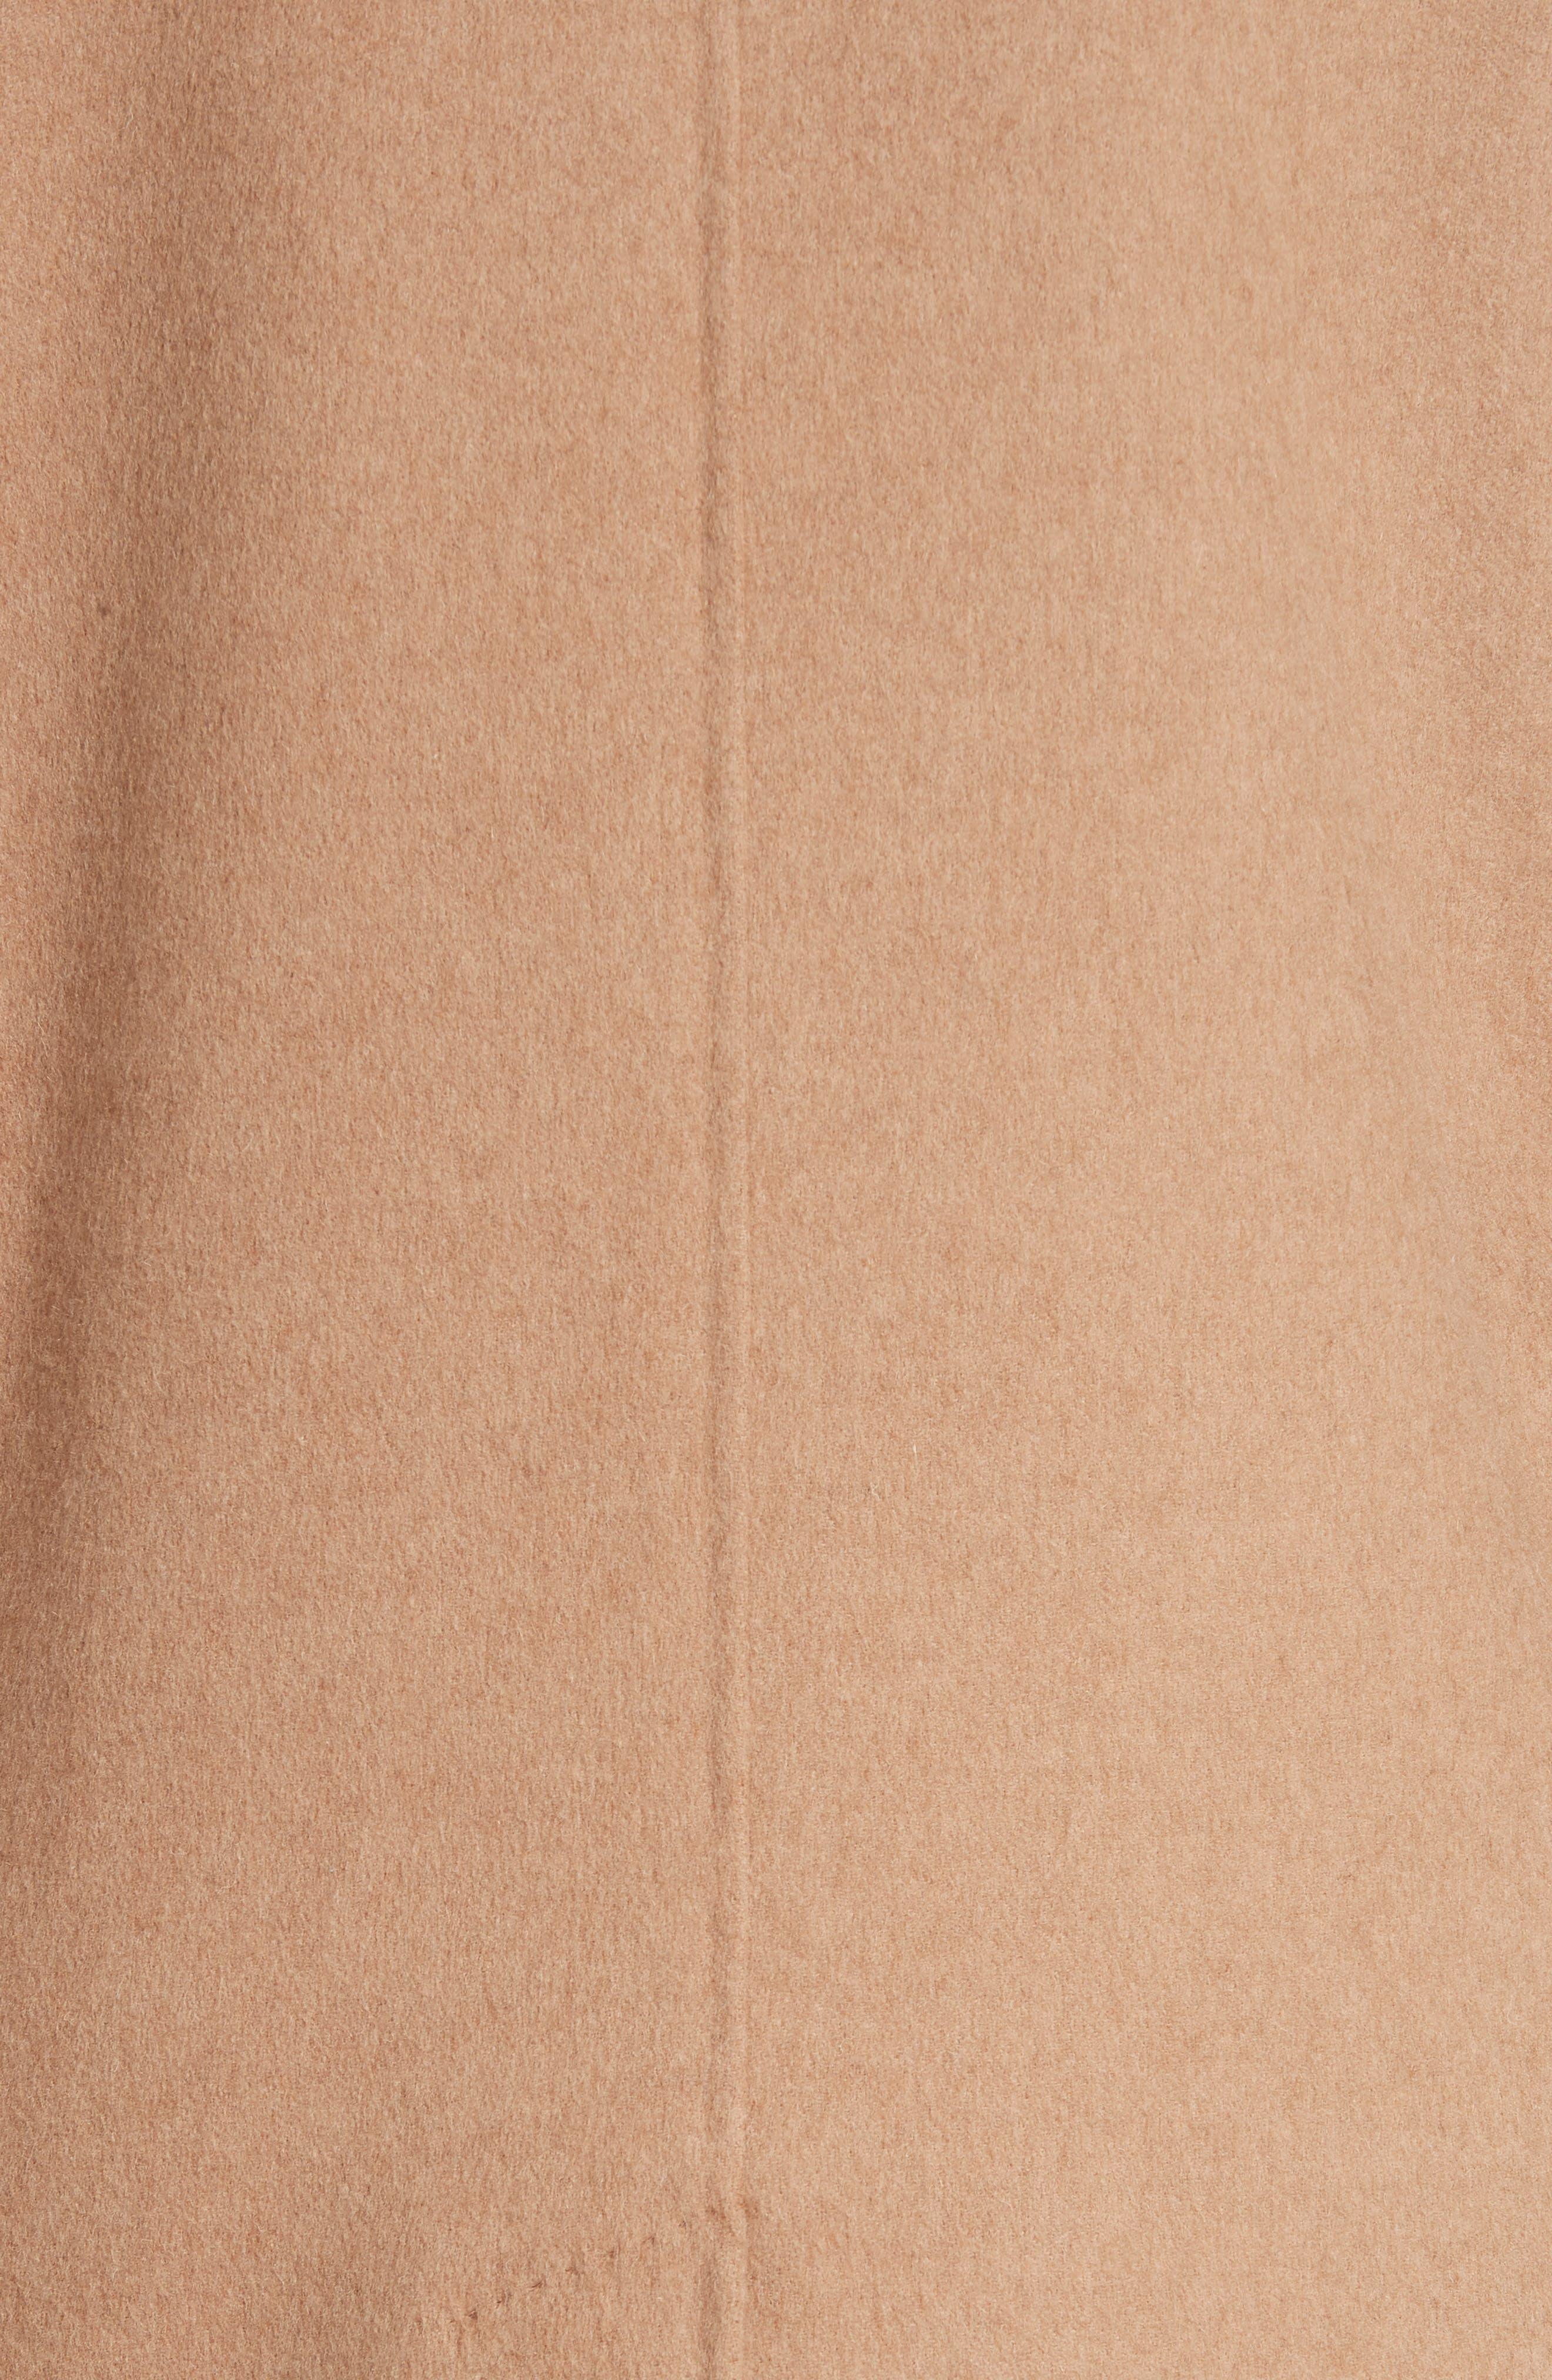 Aureo Camel Hair Coat,                             Alternate thumbnail 5, color,                             Camel